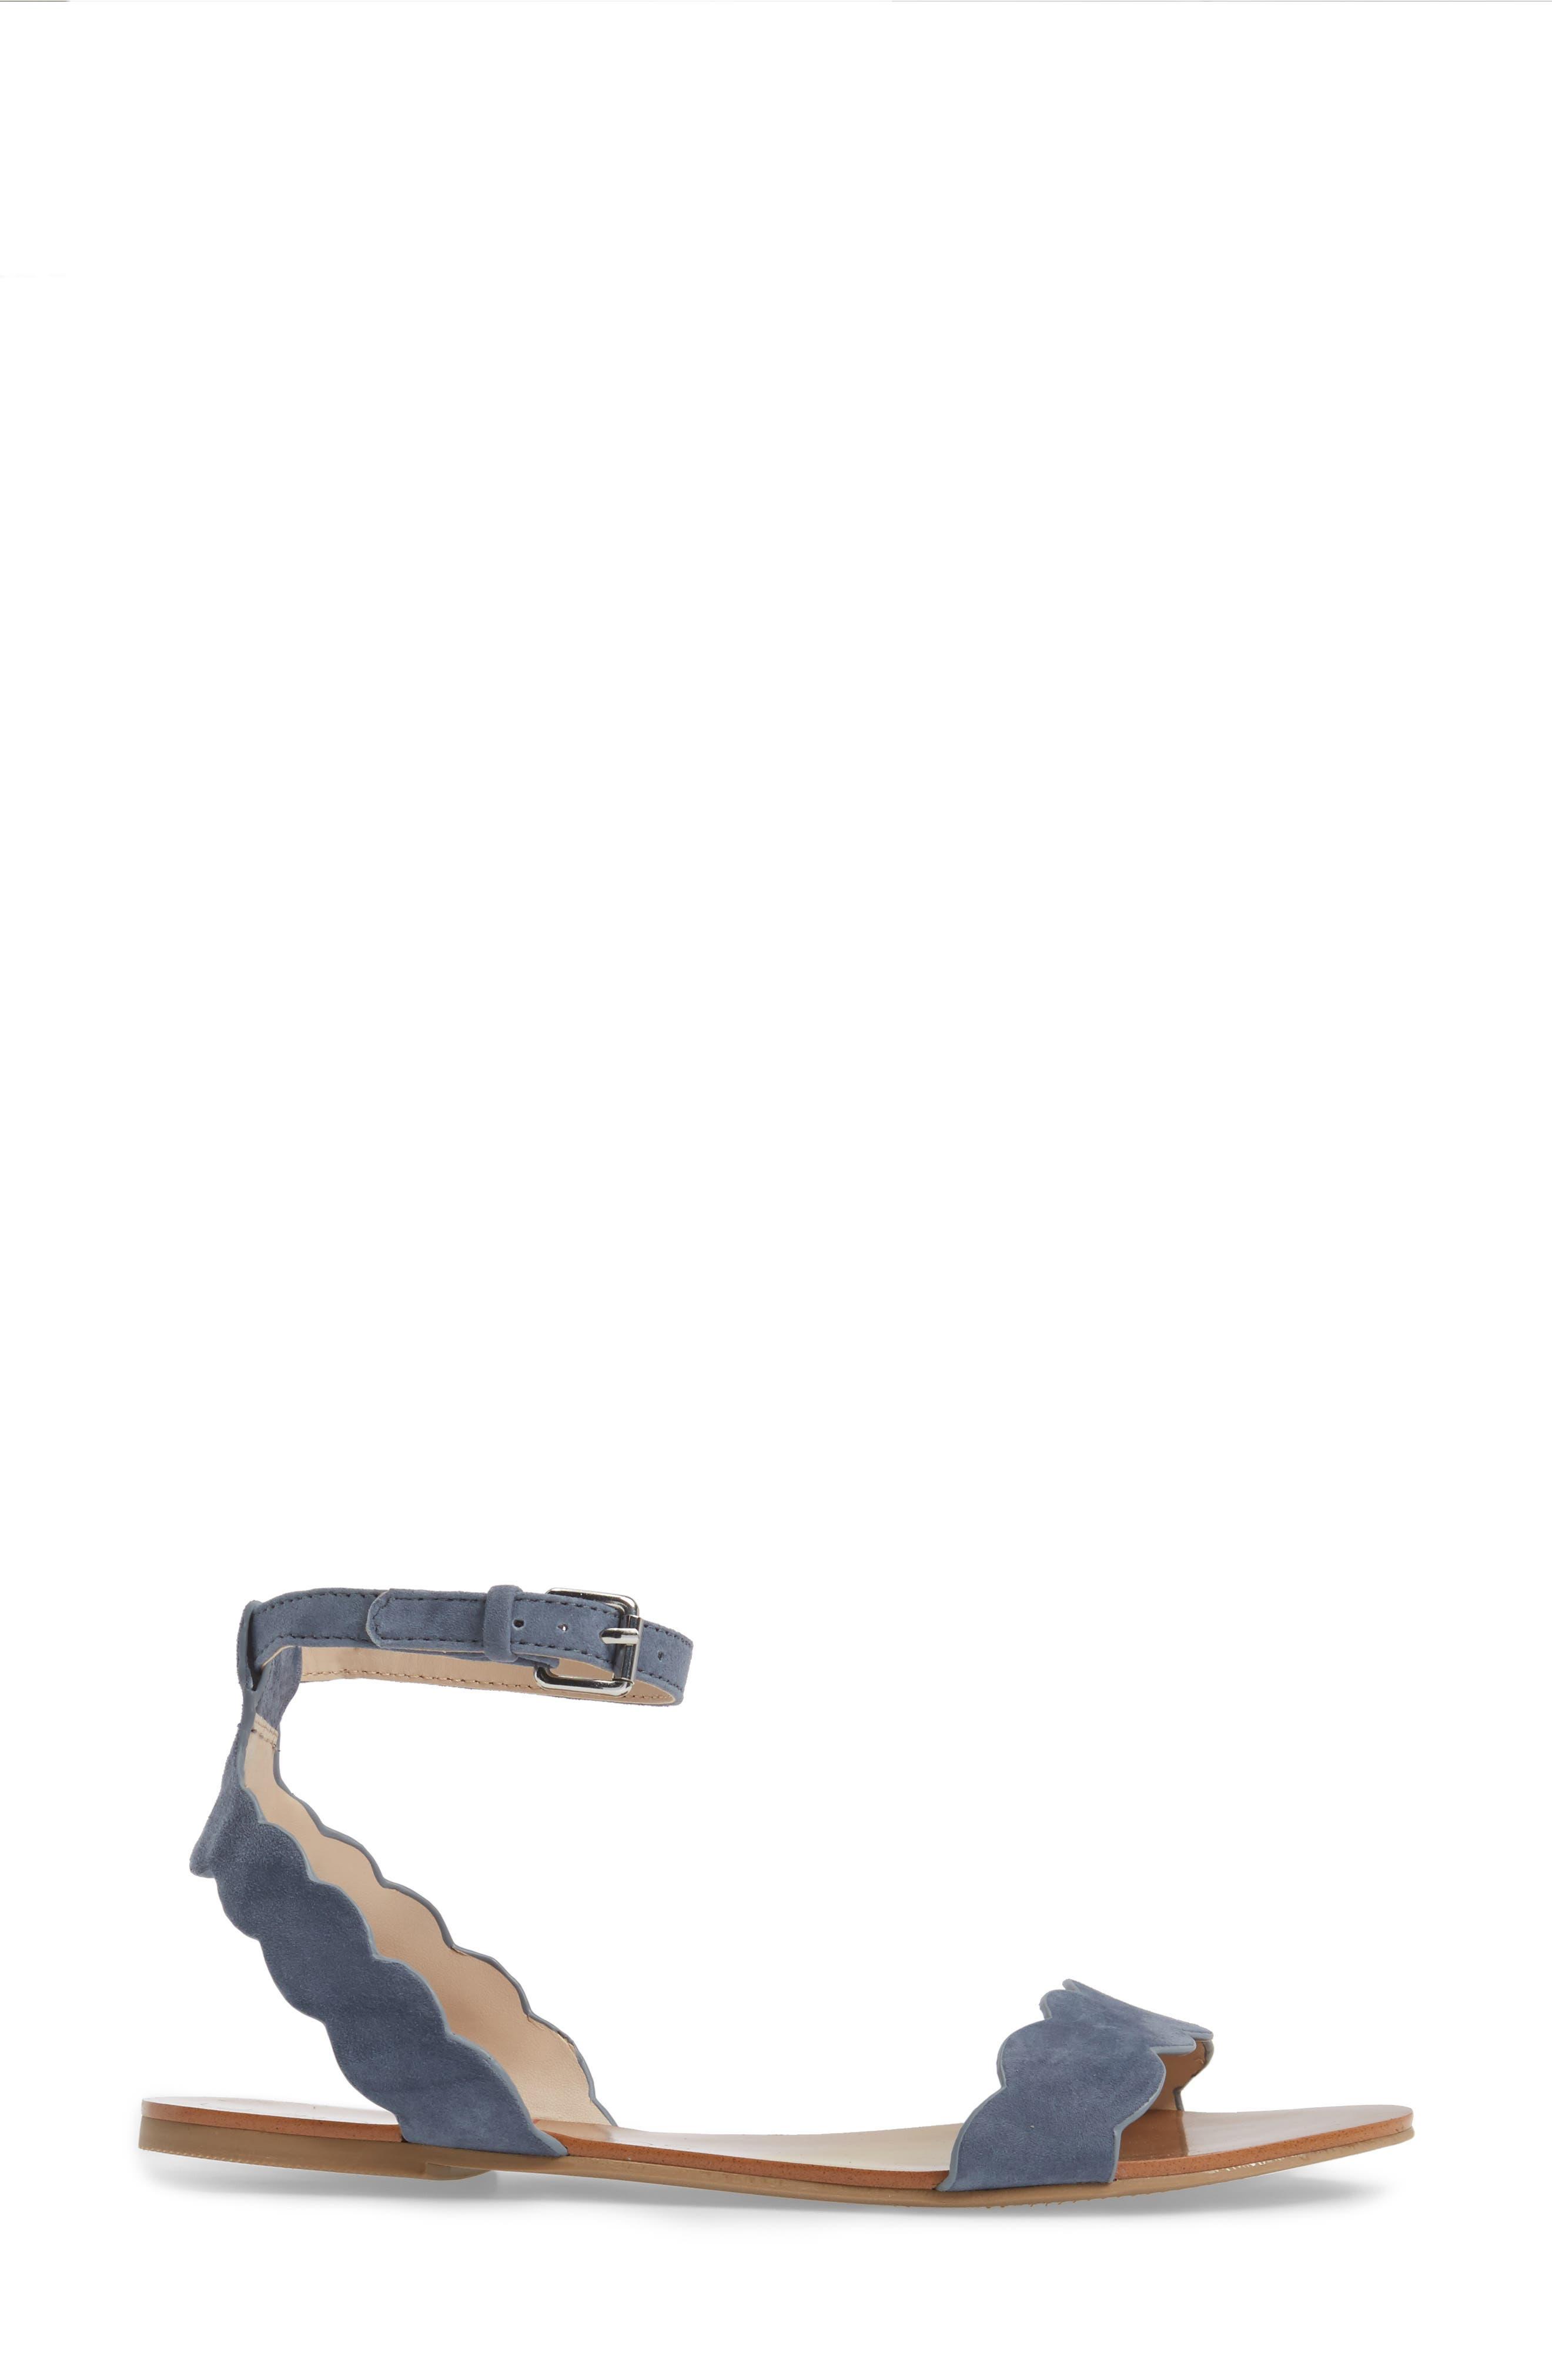 Alternate Image 3  - Sole Society 'Odette' Scalloped Ankle Strap Flat Sandal (Women)